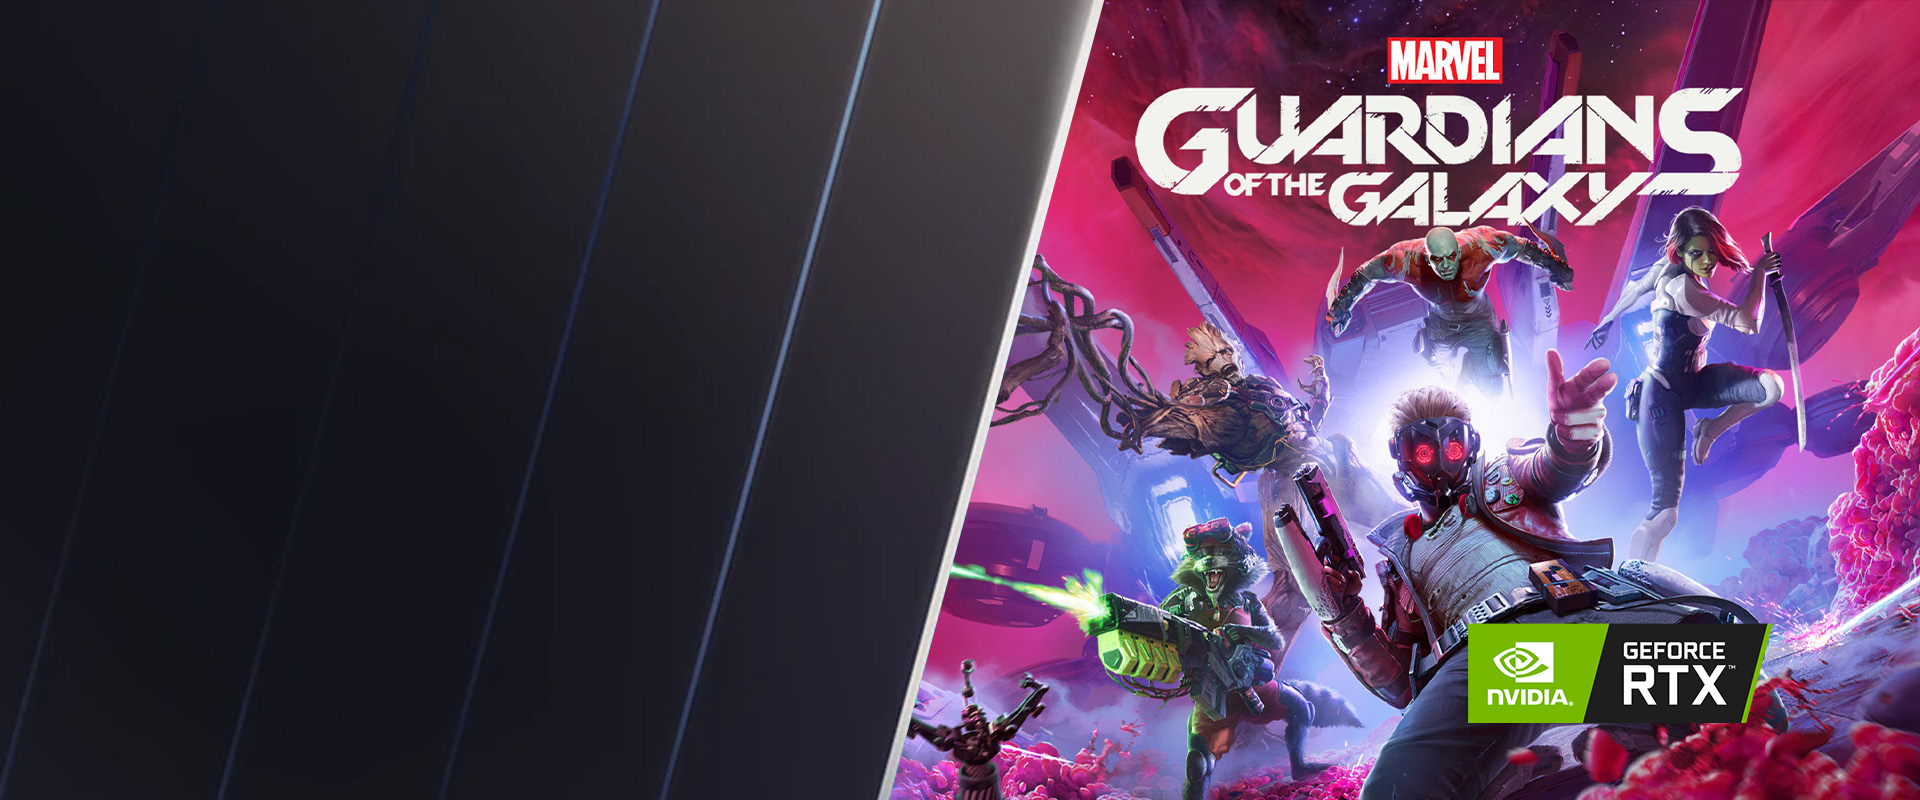 NVIDIA Bundle - Guardians of the Galaxy